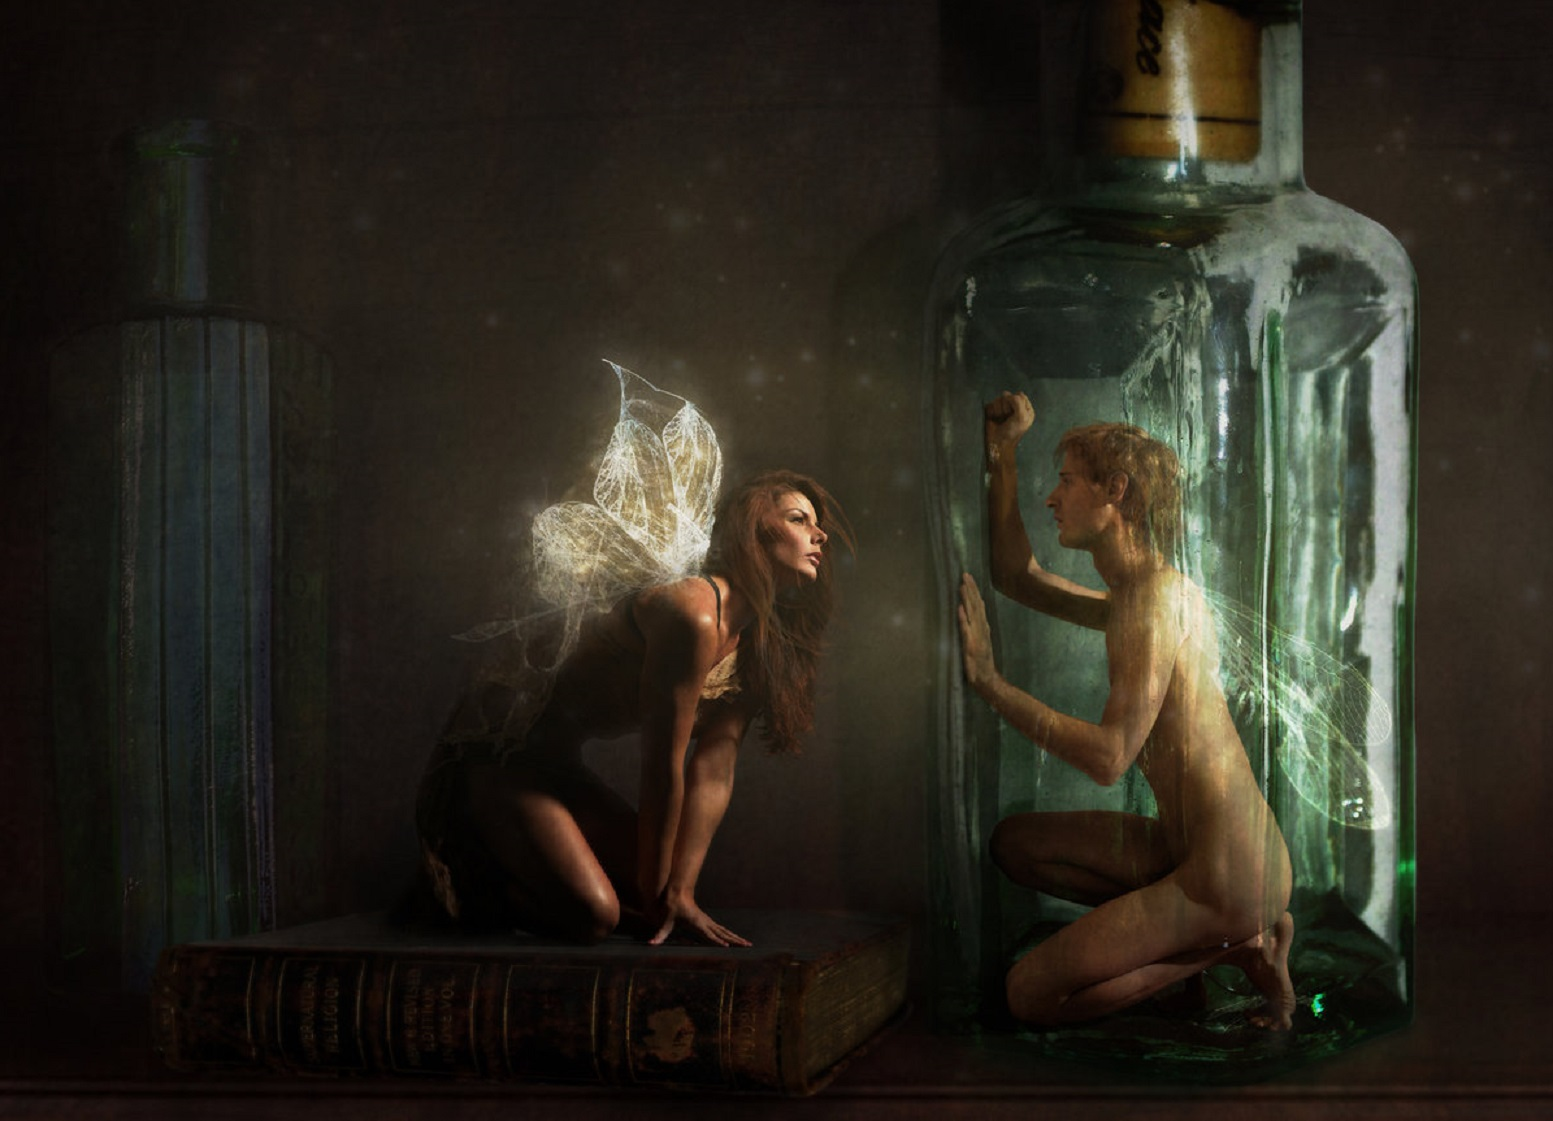 free deviantart cm your_light_by_erinm31-d4c1j7c